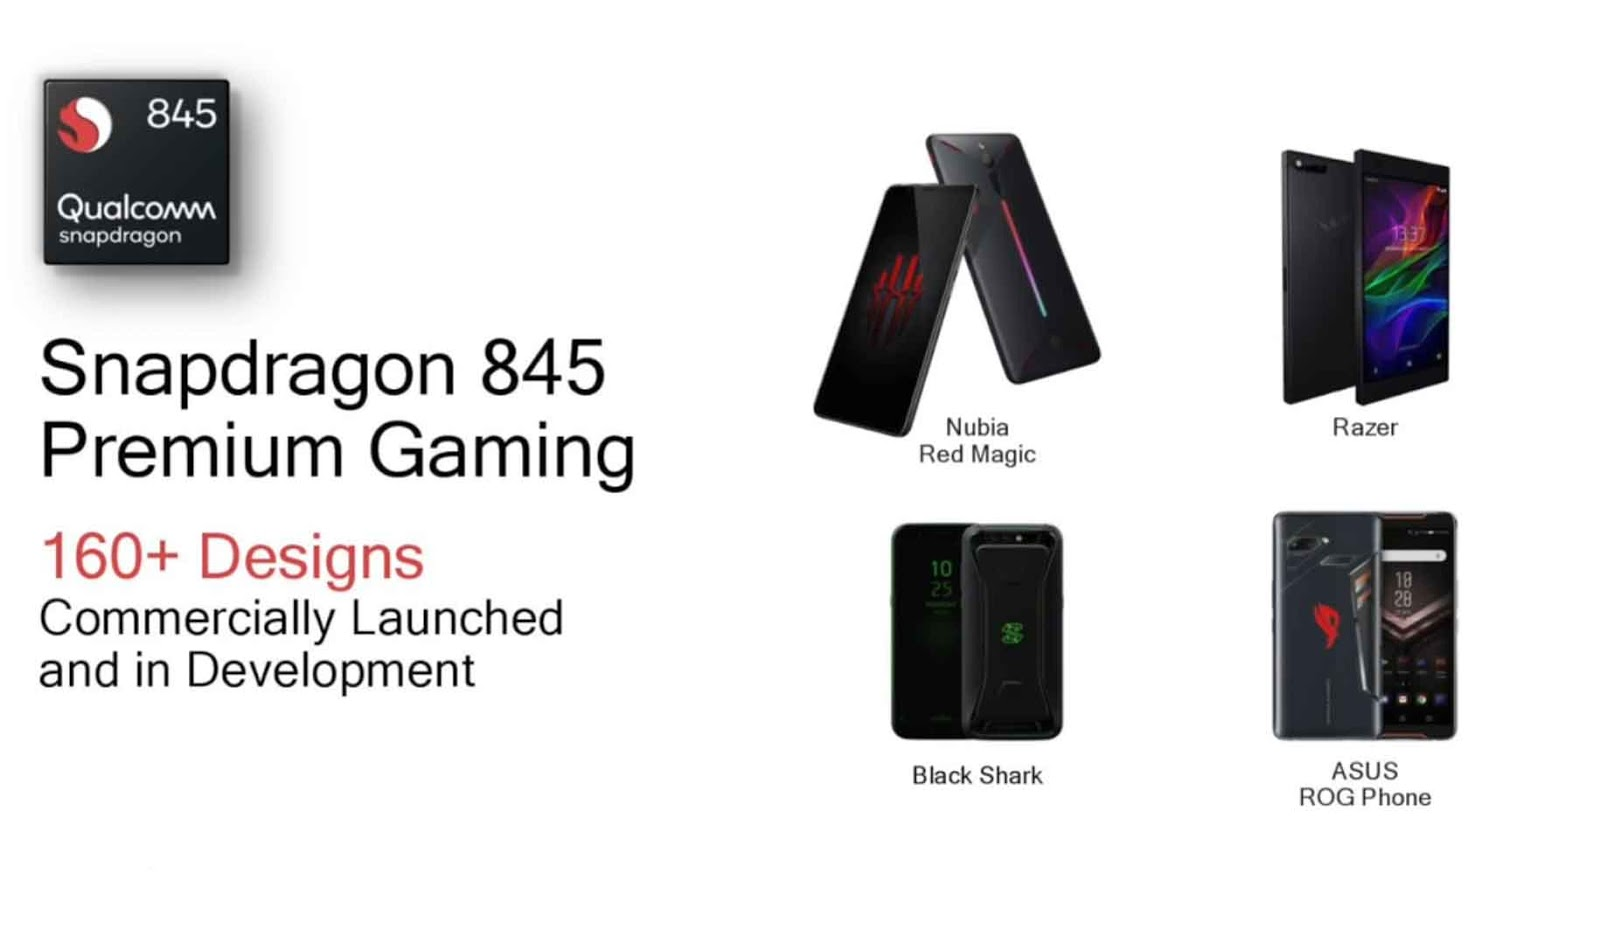 Qualcomm Snapdragon 855 Features 5G, AI, 7nm Technology - TechnoSagar